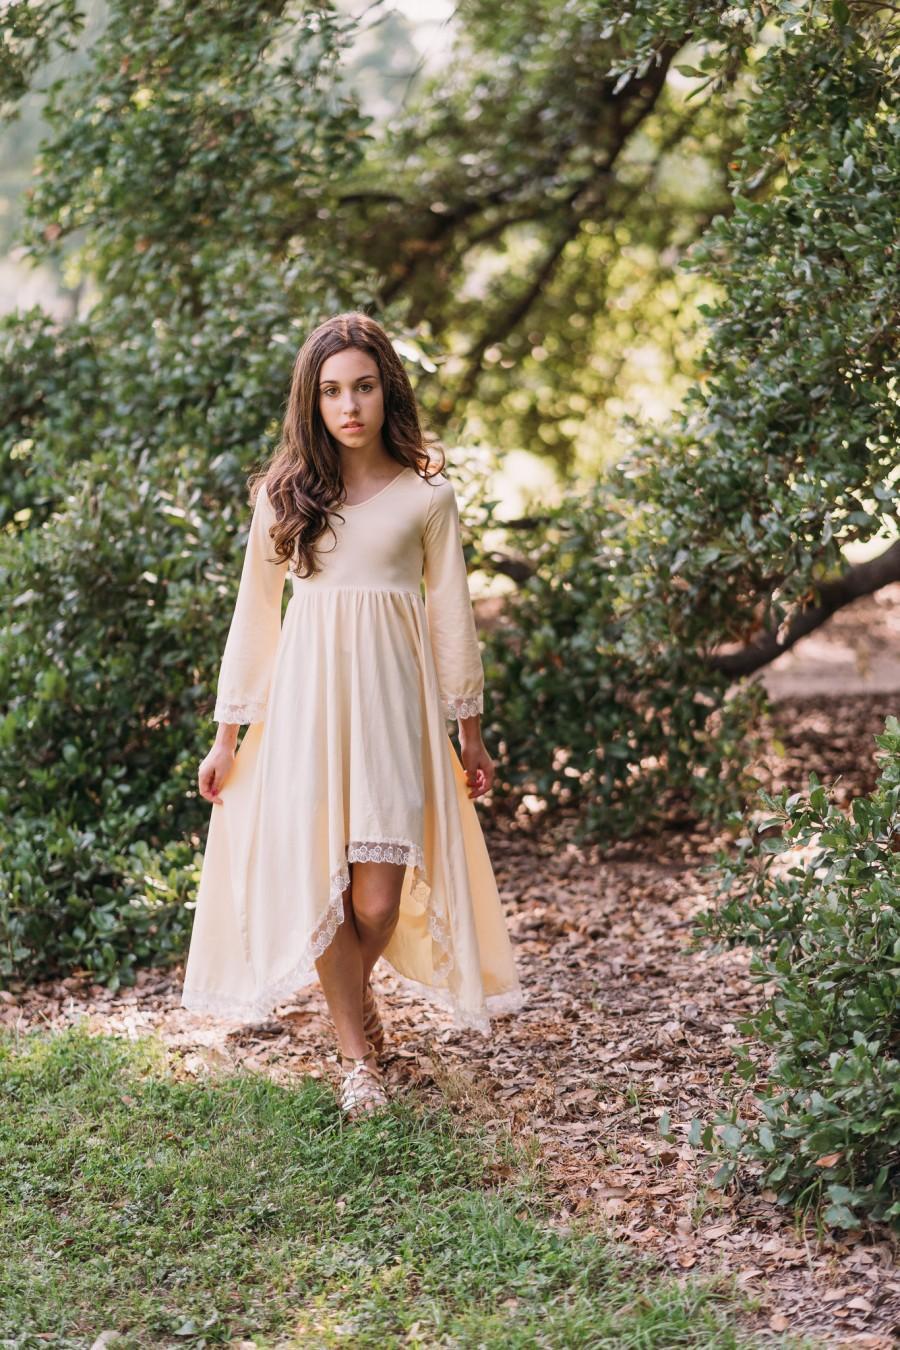 Hochzeit - Ivory Cream Flower Girl Dress Tween Rustic Country Maxi Dress Bohemian Jr Bridesmaid High Low Dress Hippie Bell Sleeves Romantic Guinevere